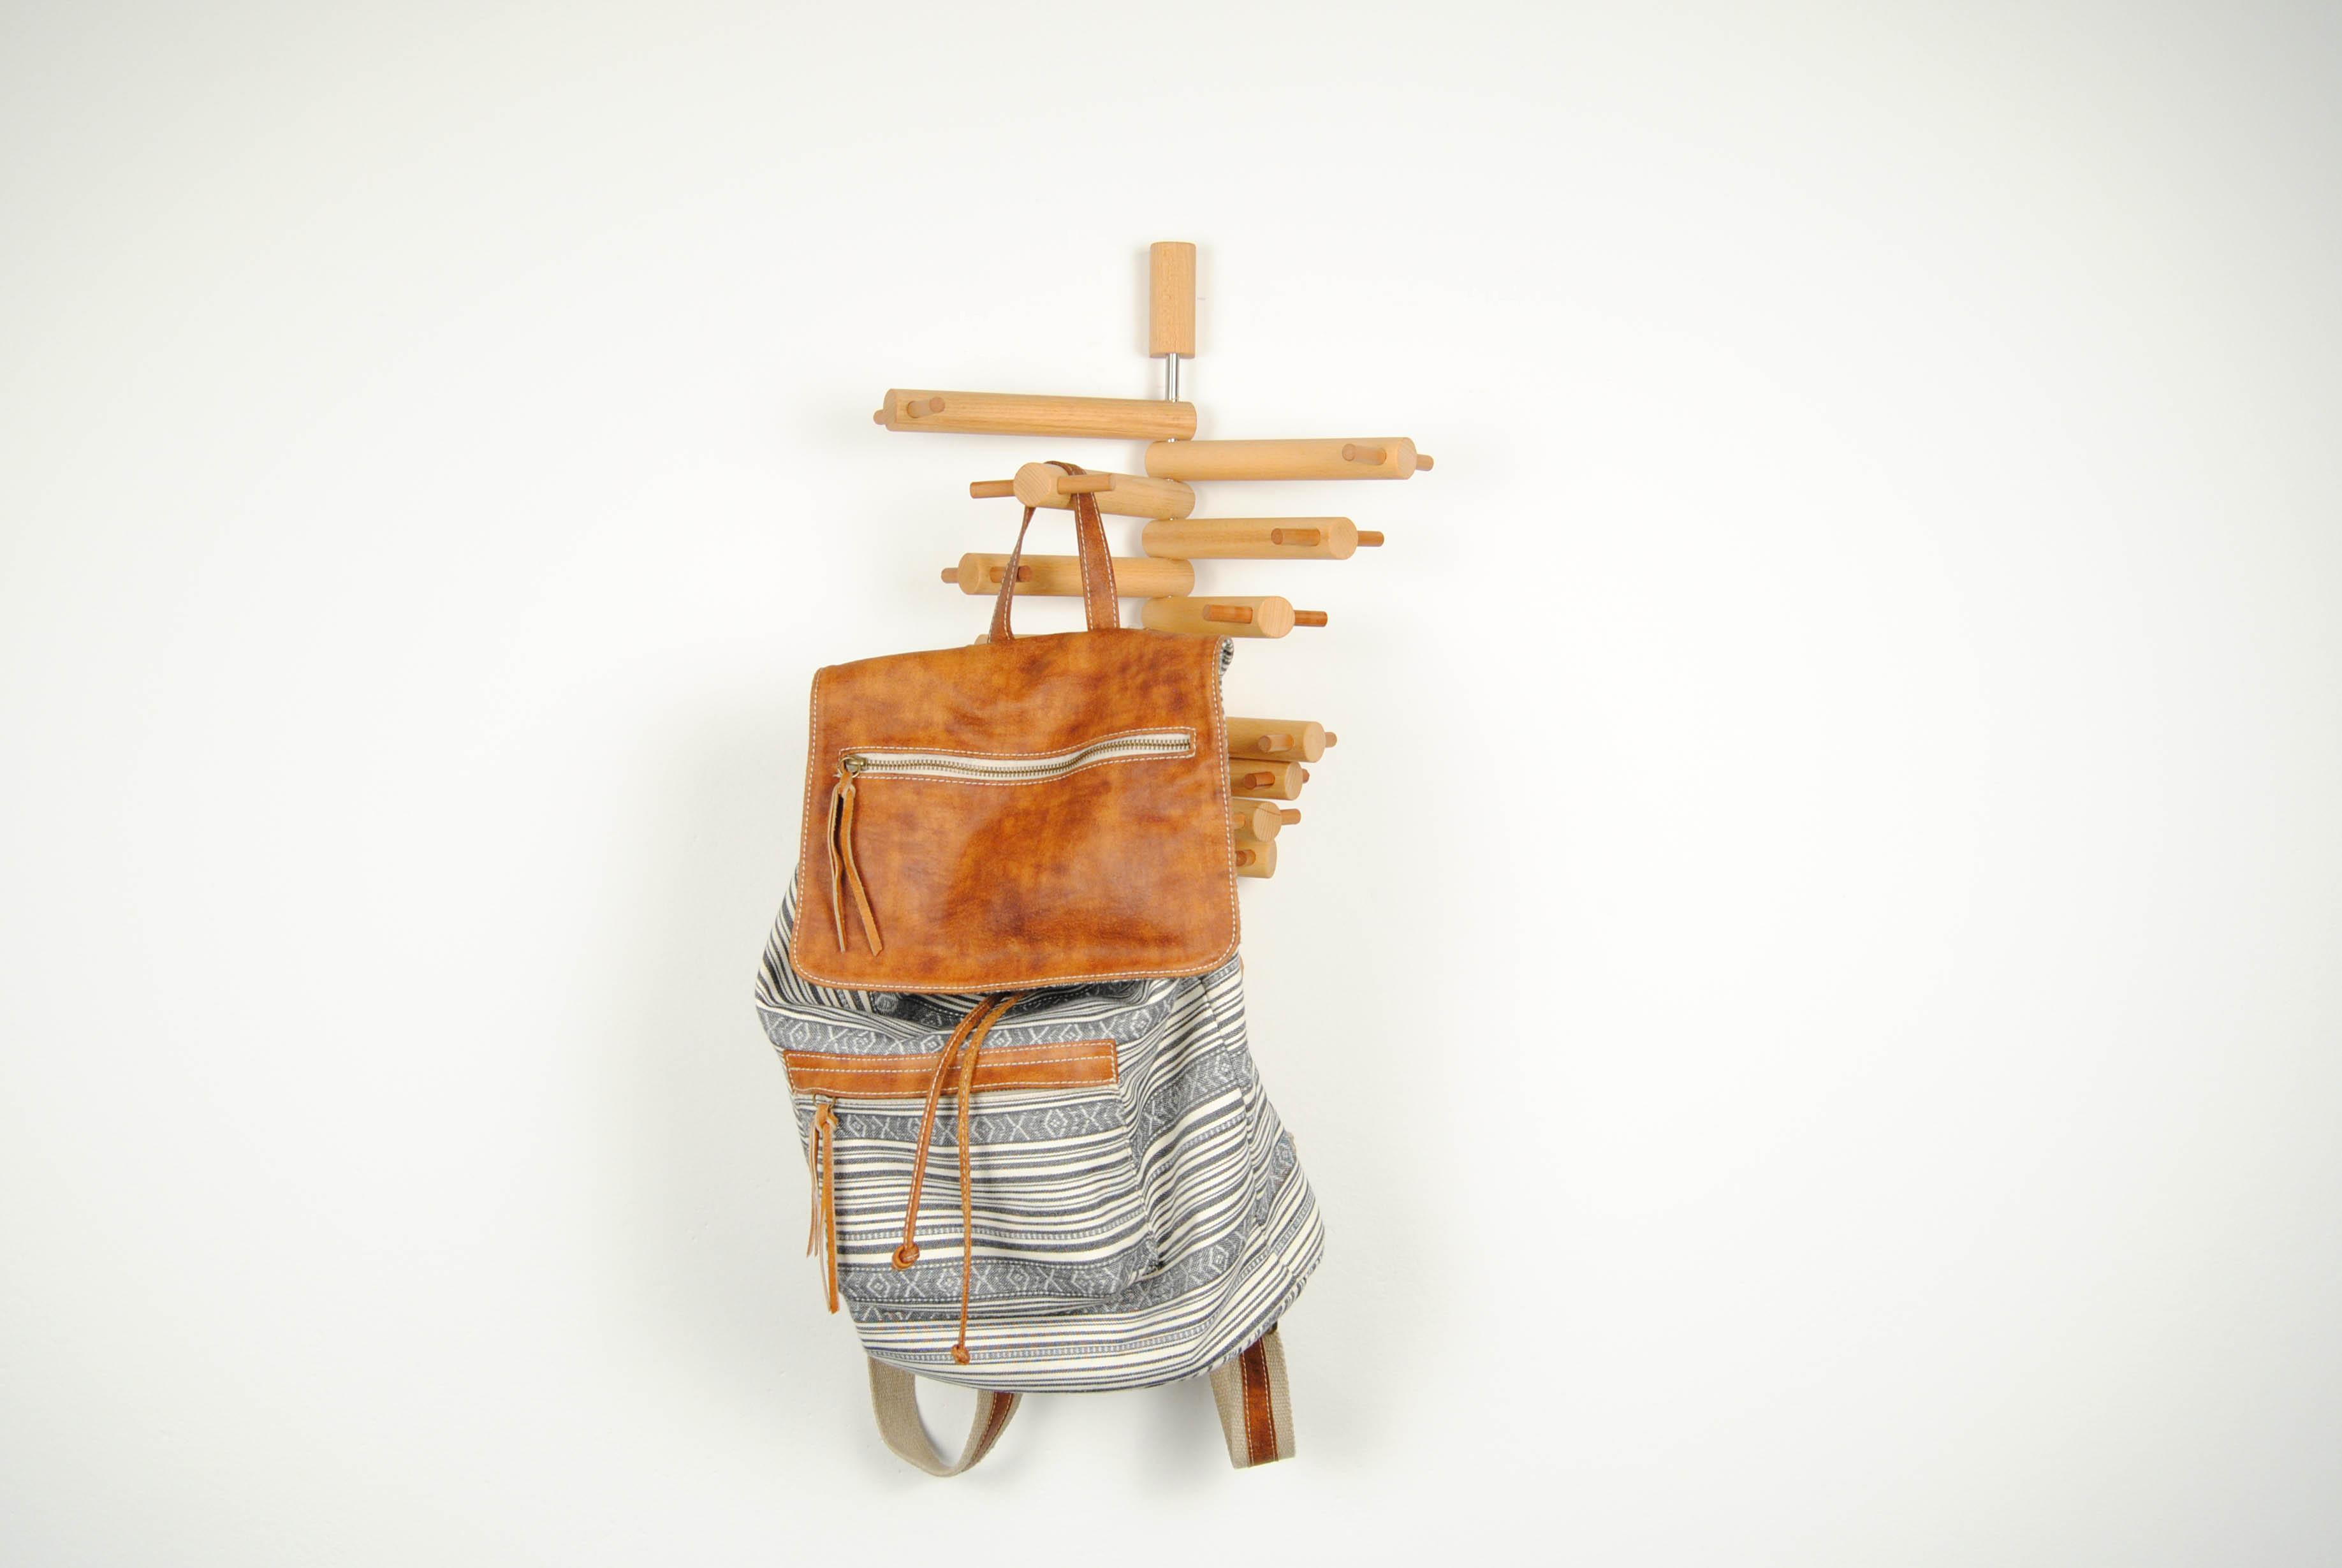 21 wooden coat hook with bag